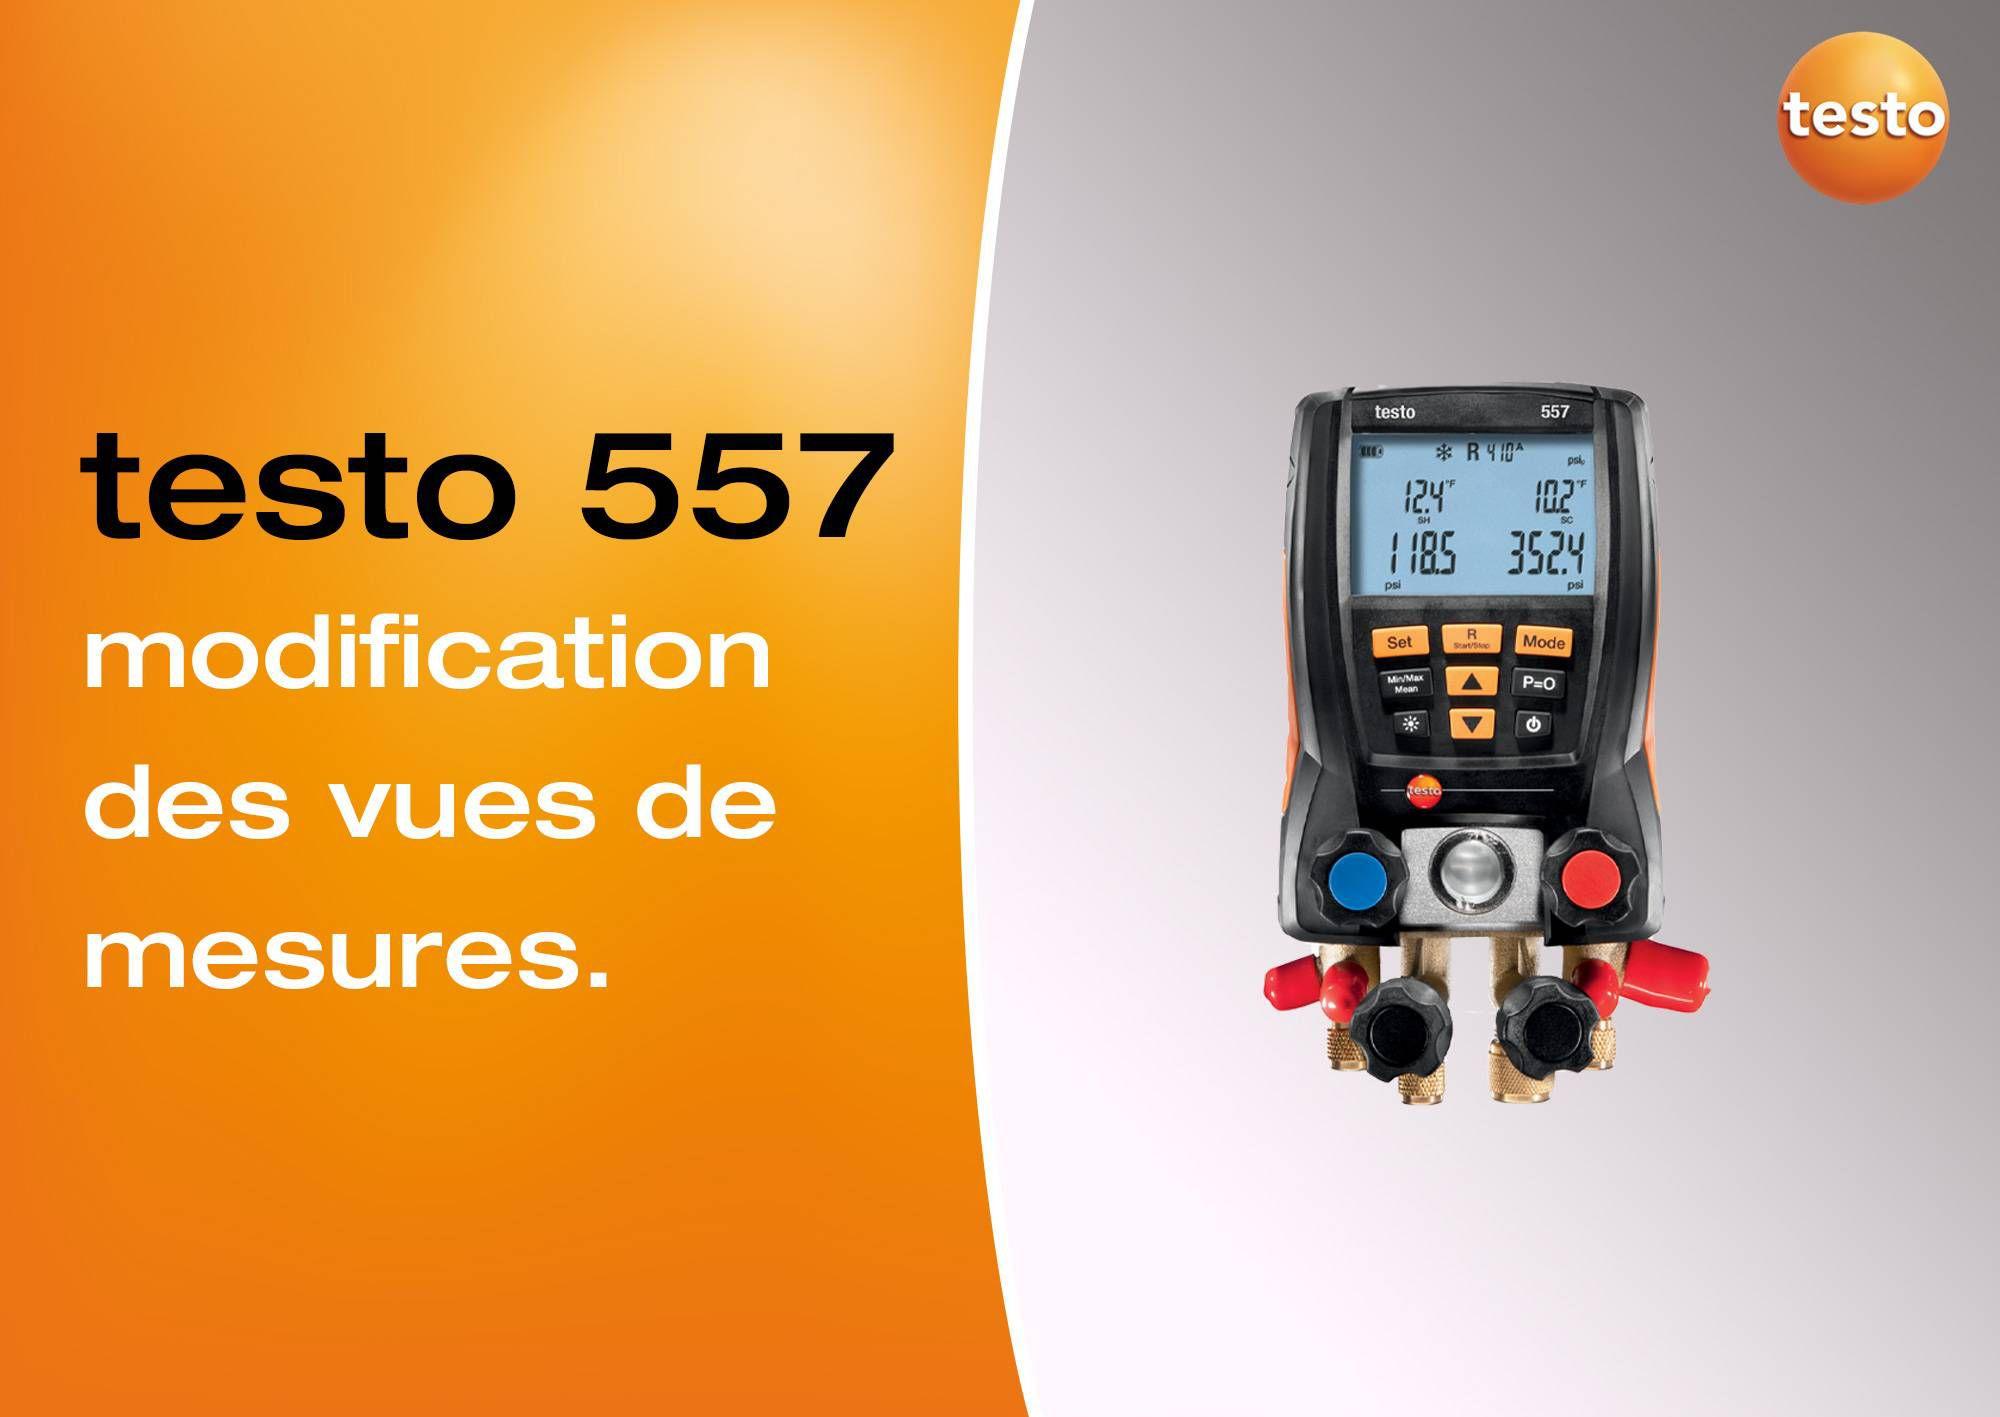 Tutoriel vidéo modification des vues de mesure manomètre testo 557